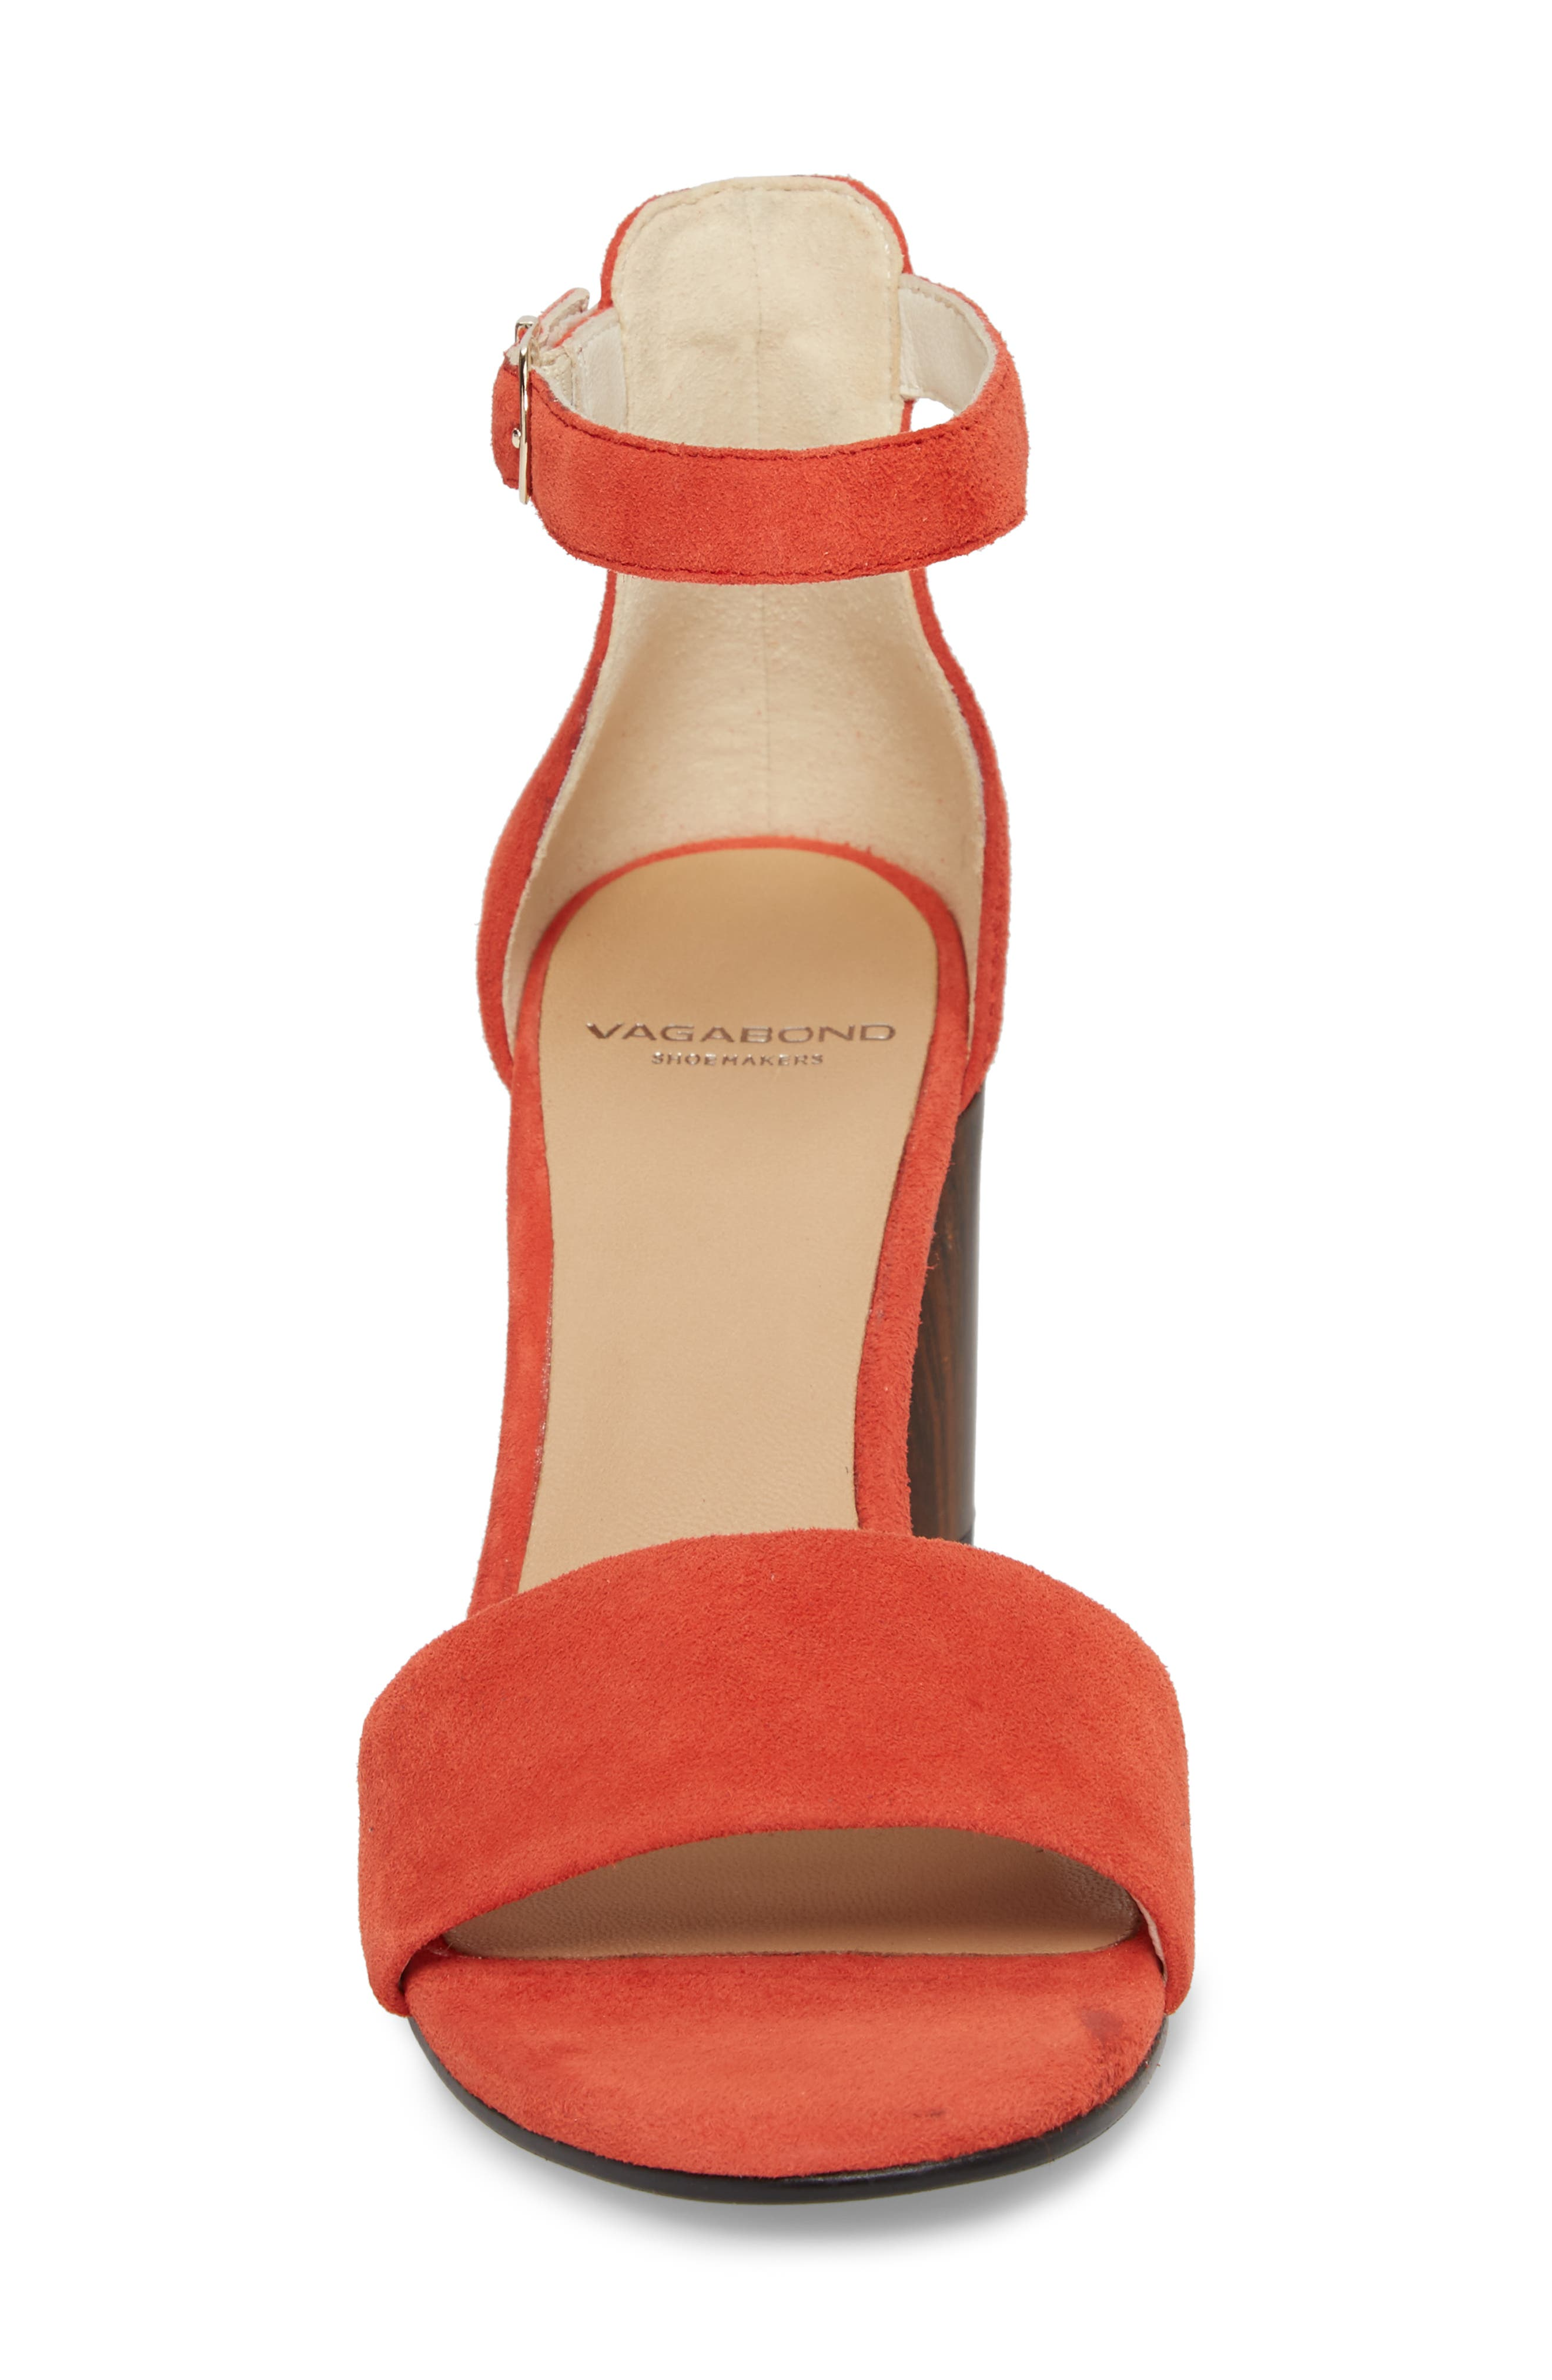 Carol Ankle Strap Sandal,                             Alternate thumbnail 4, color,                             Coral Suede